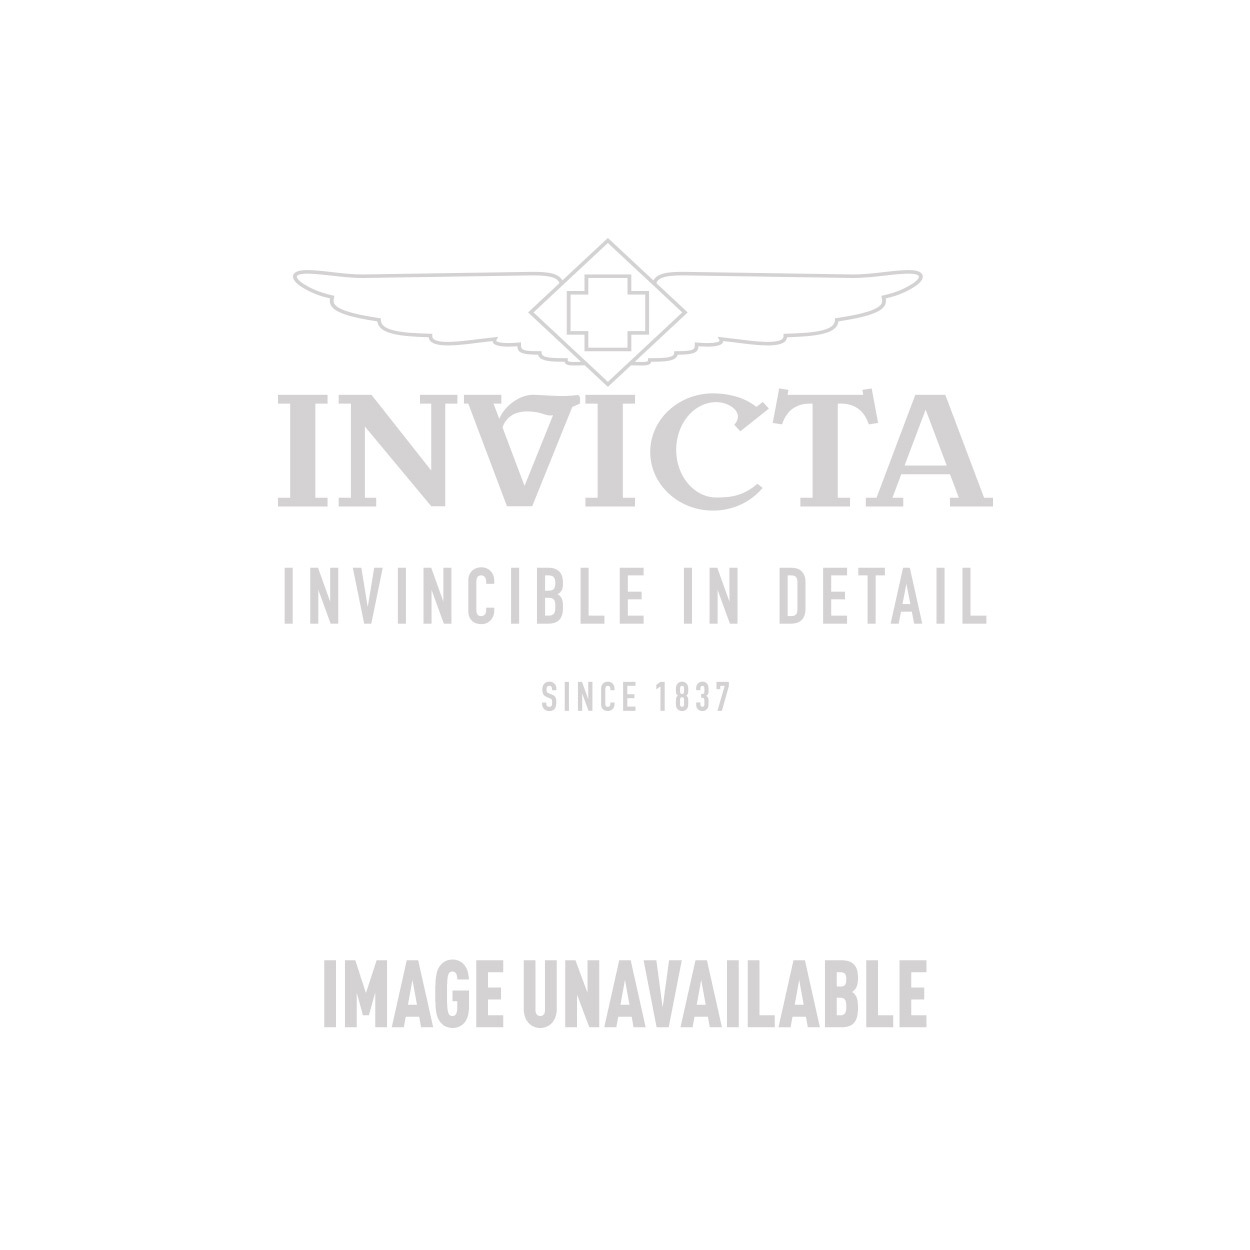 Invicta 22.25cm Bracelets in Rhodium Aged - Model J0311